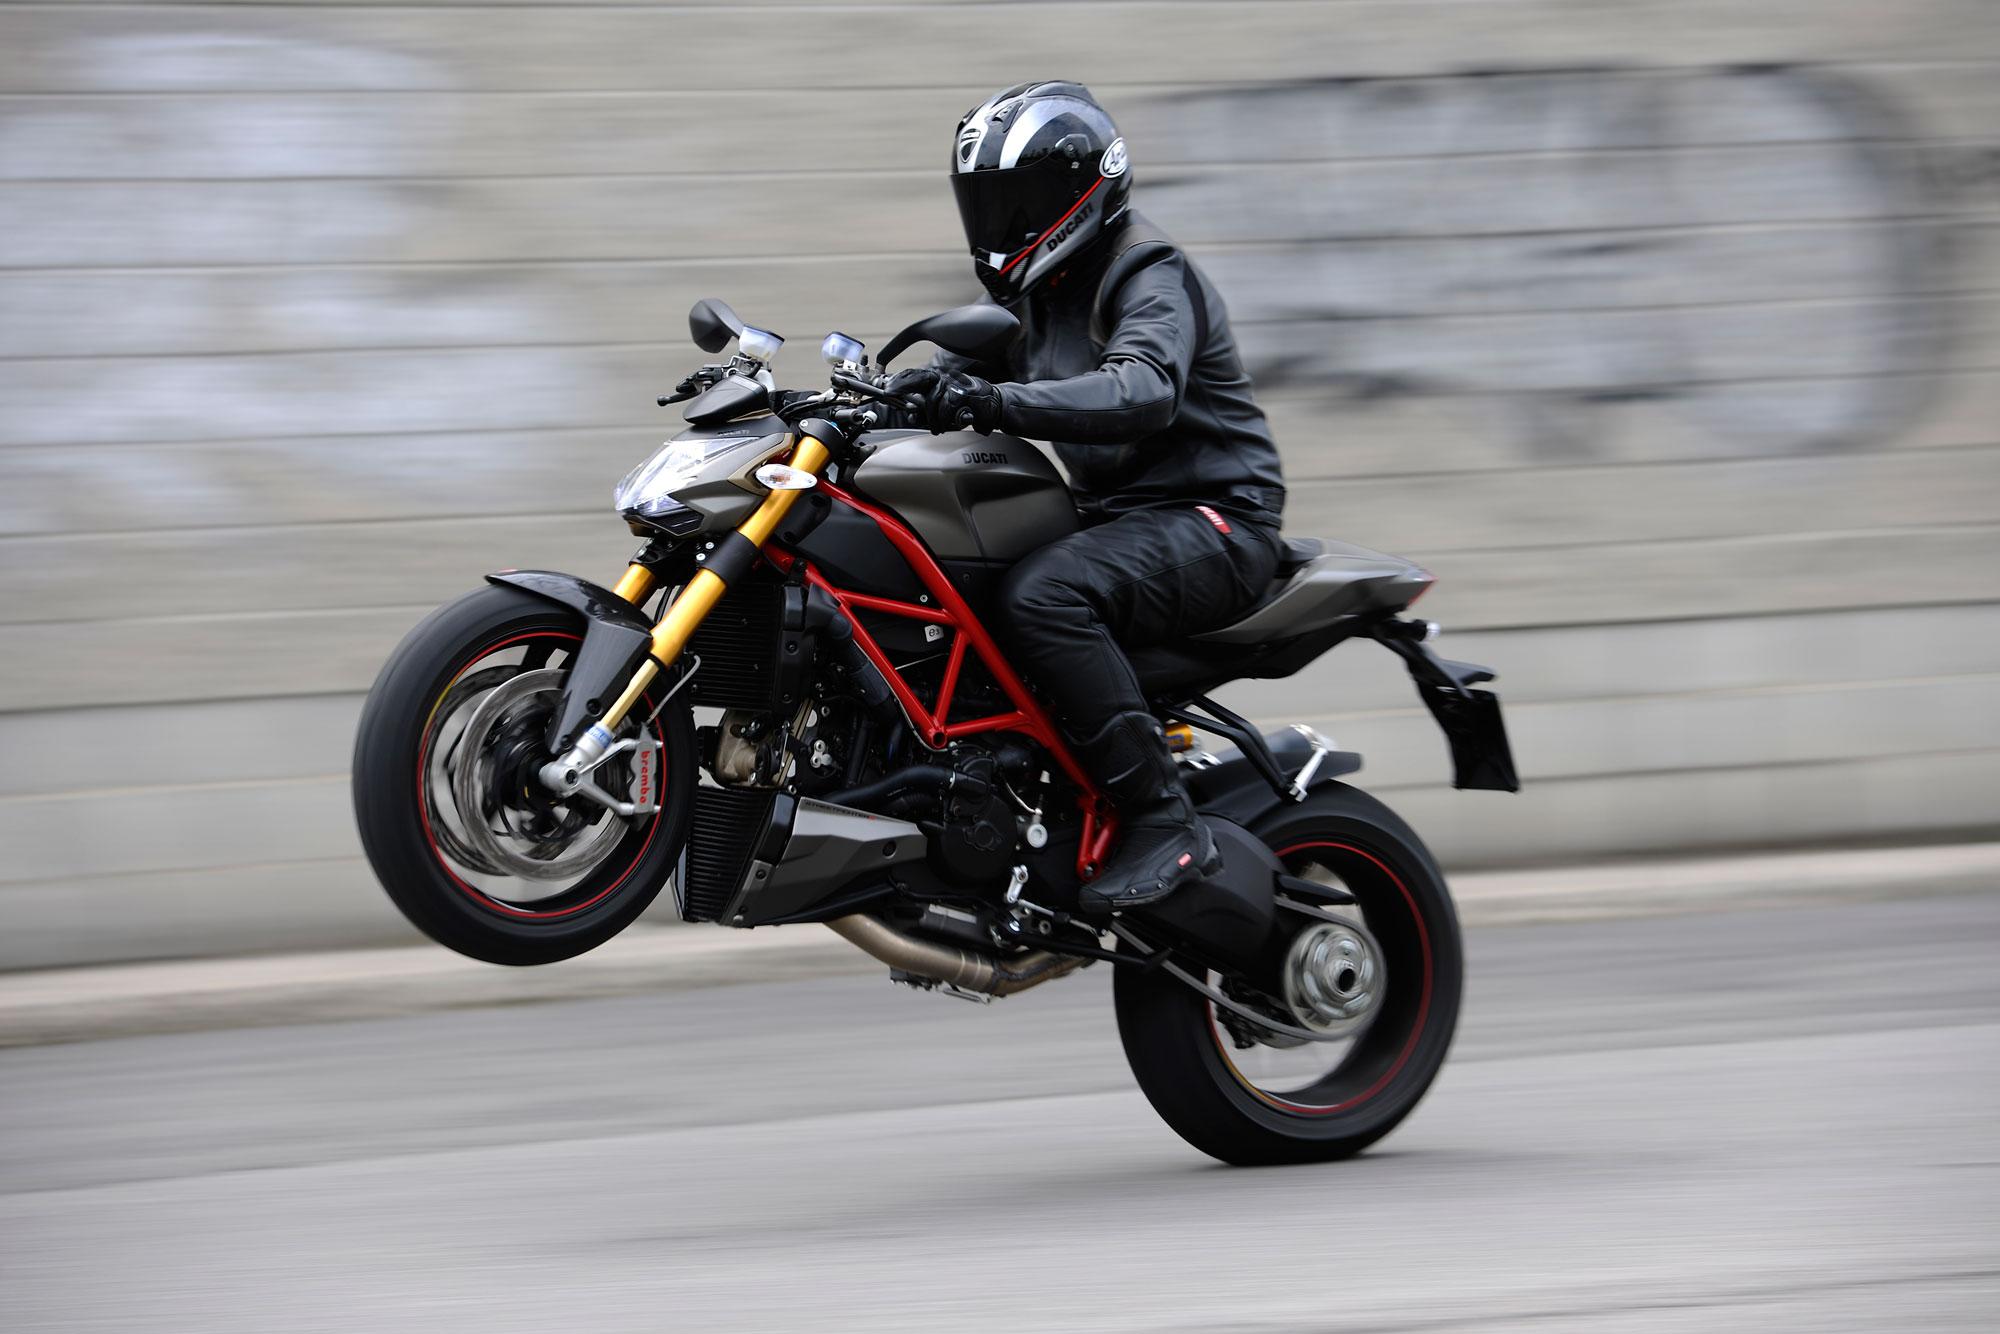 Caballito en Ducati - 2000x1334